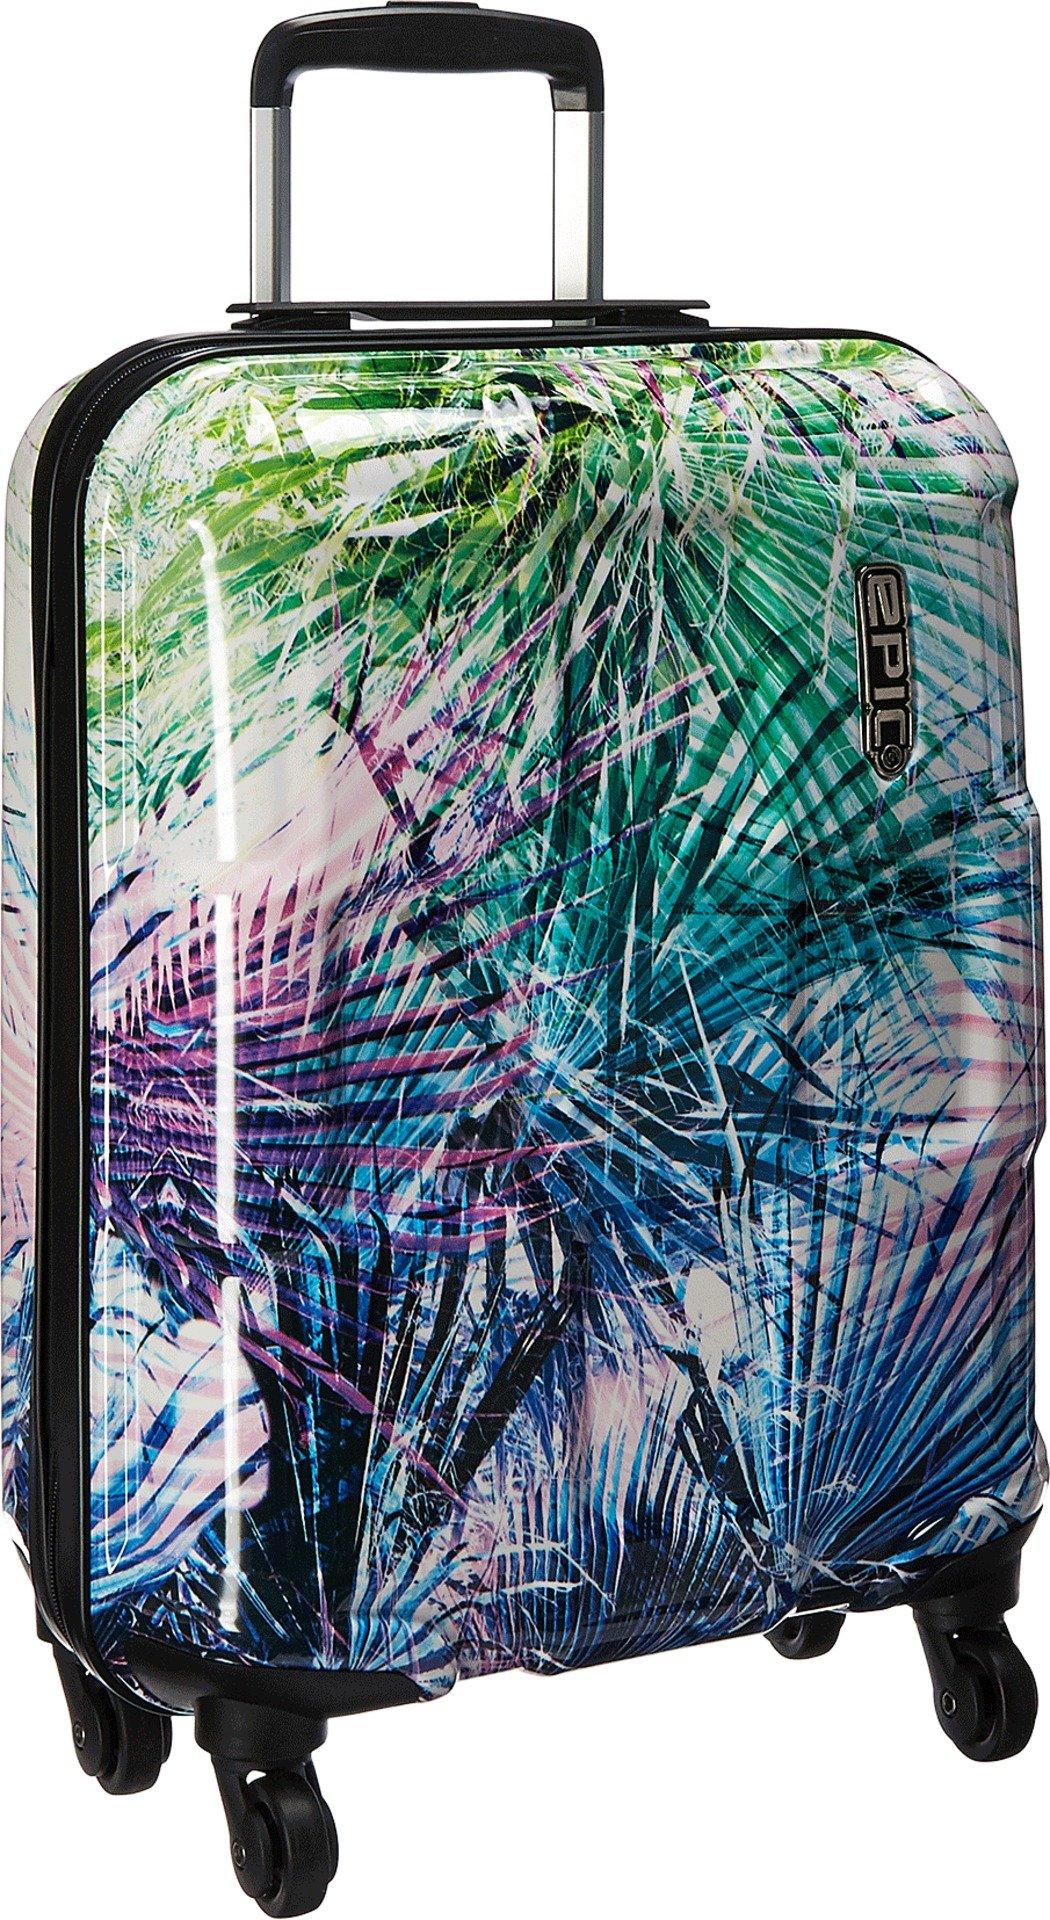 EPIC Travelgear Unisex Crate Wildlife EX 22'' Trolley Summer Shade Luggage